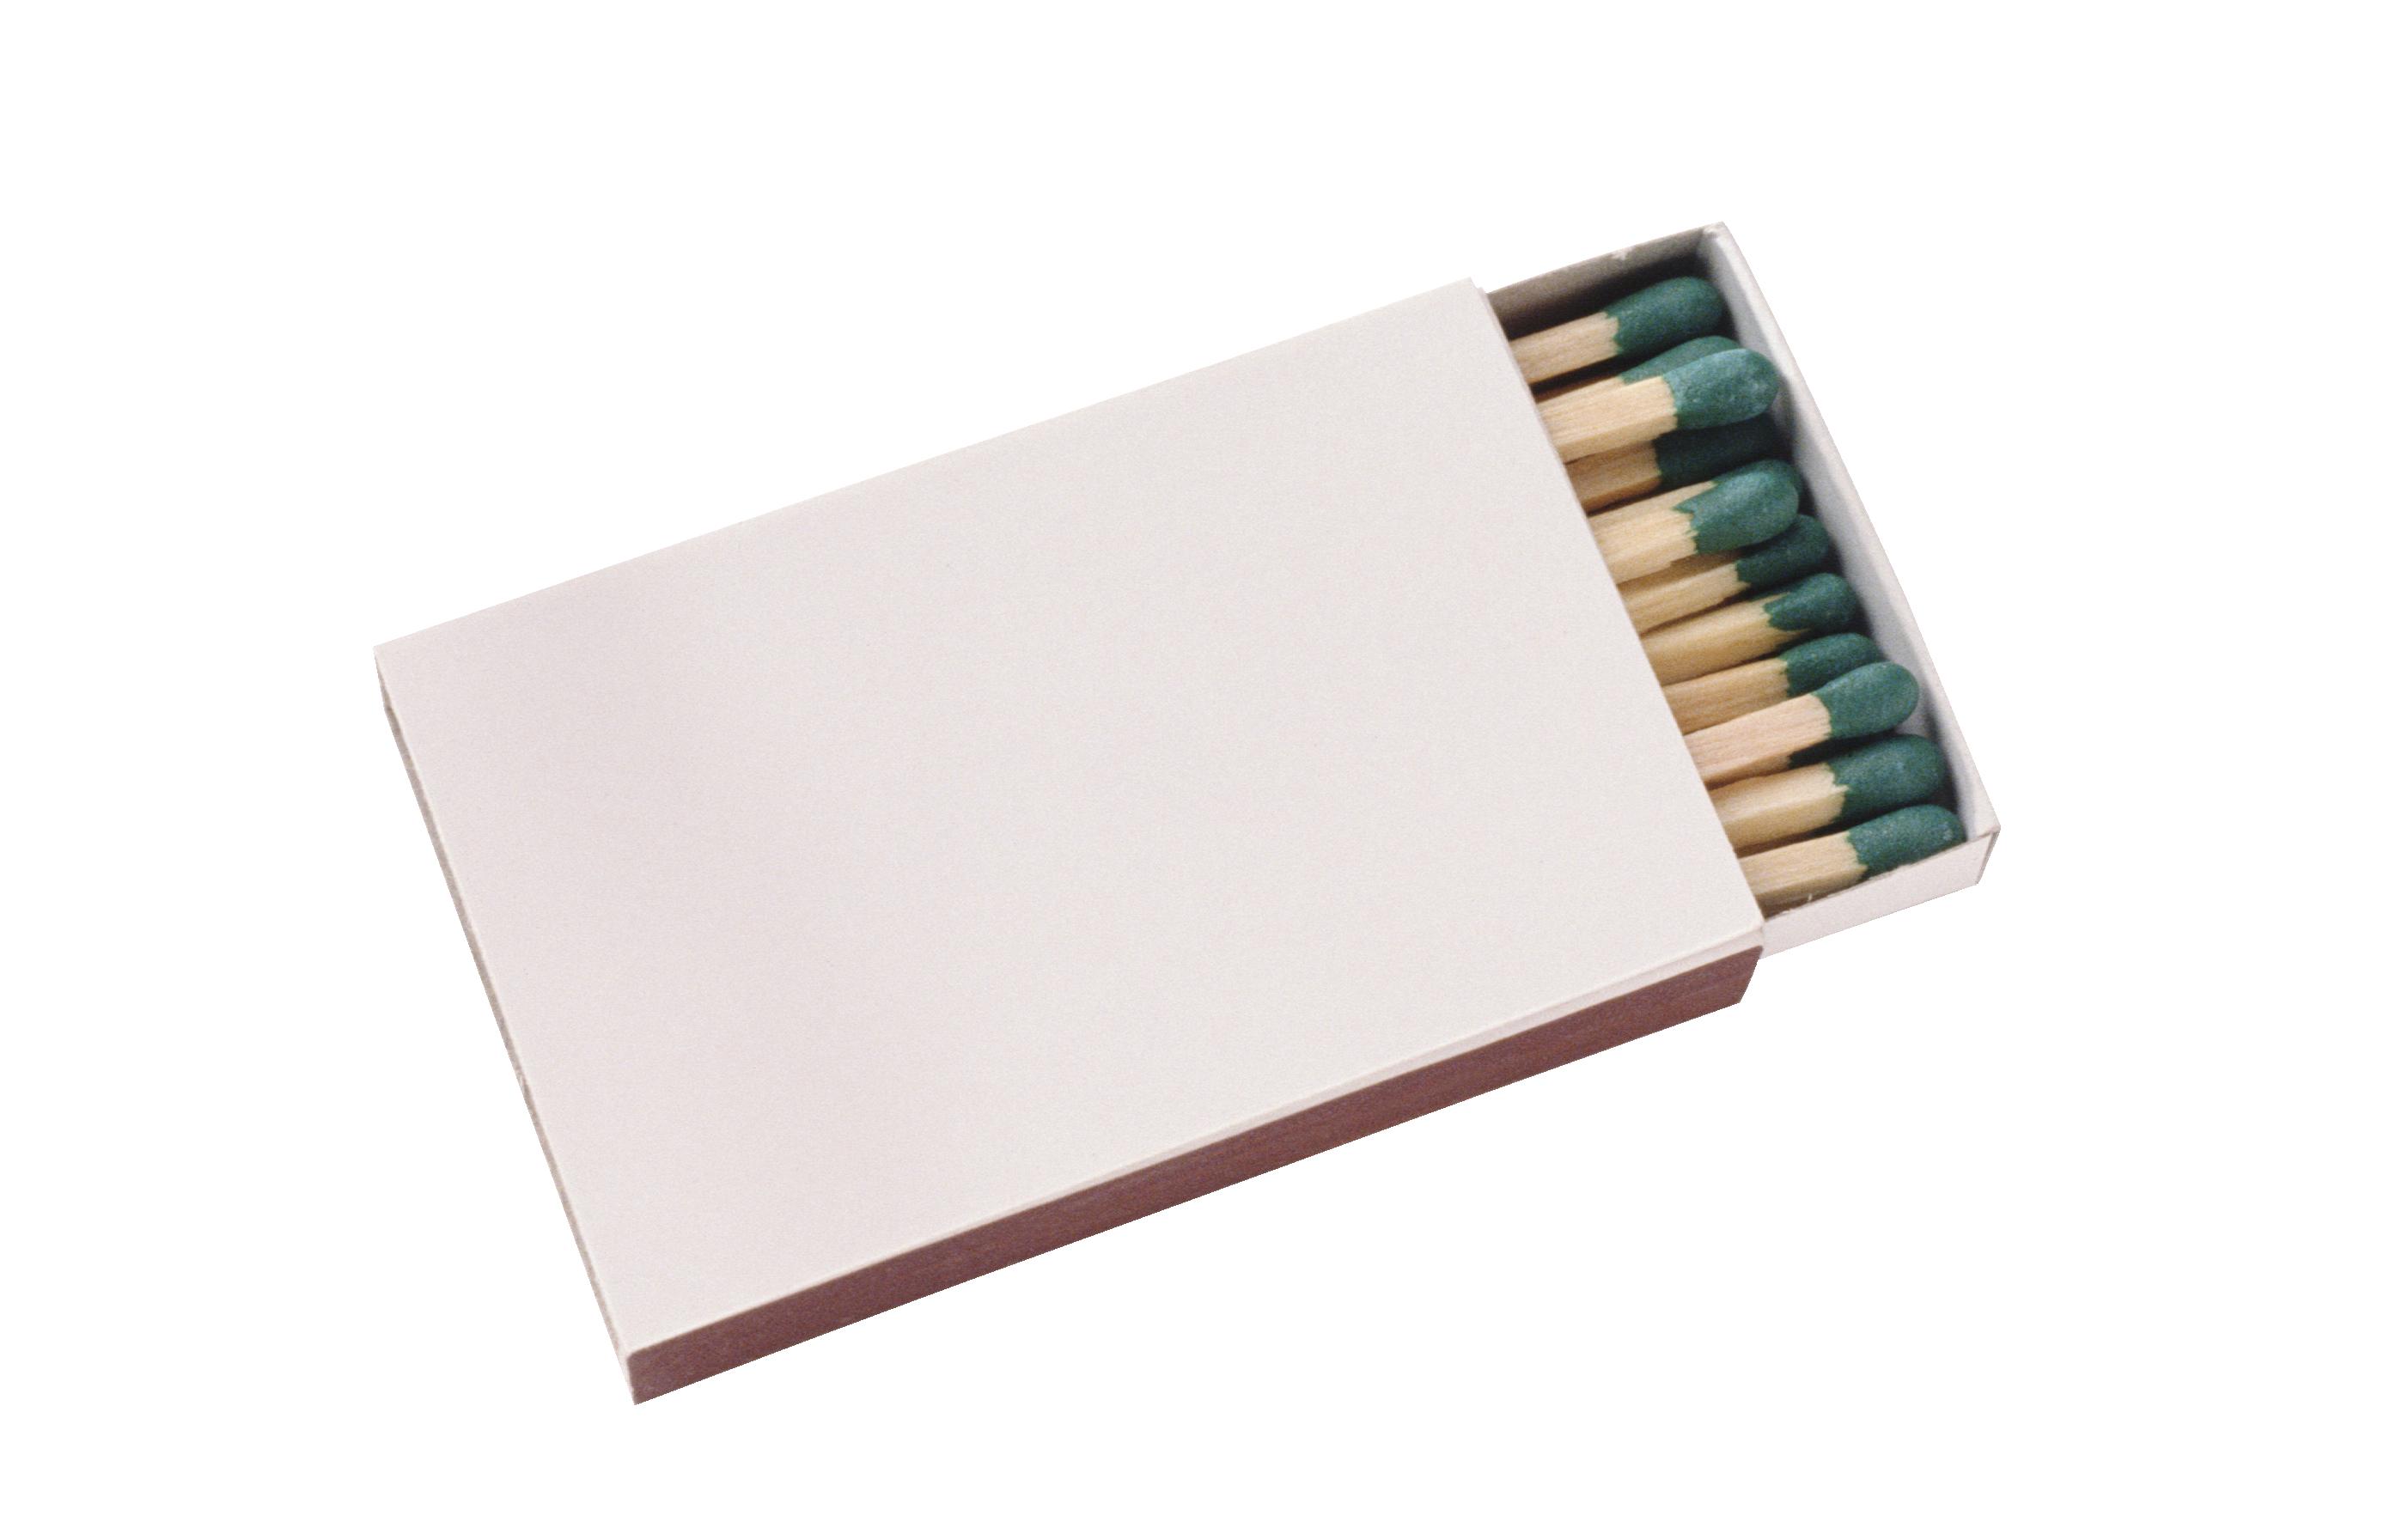 Matchbox png by absurdwordpreferred on deviantart for Modern household items